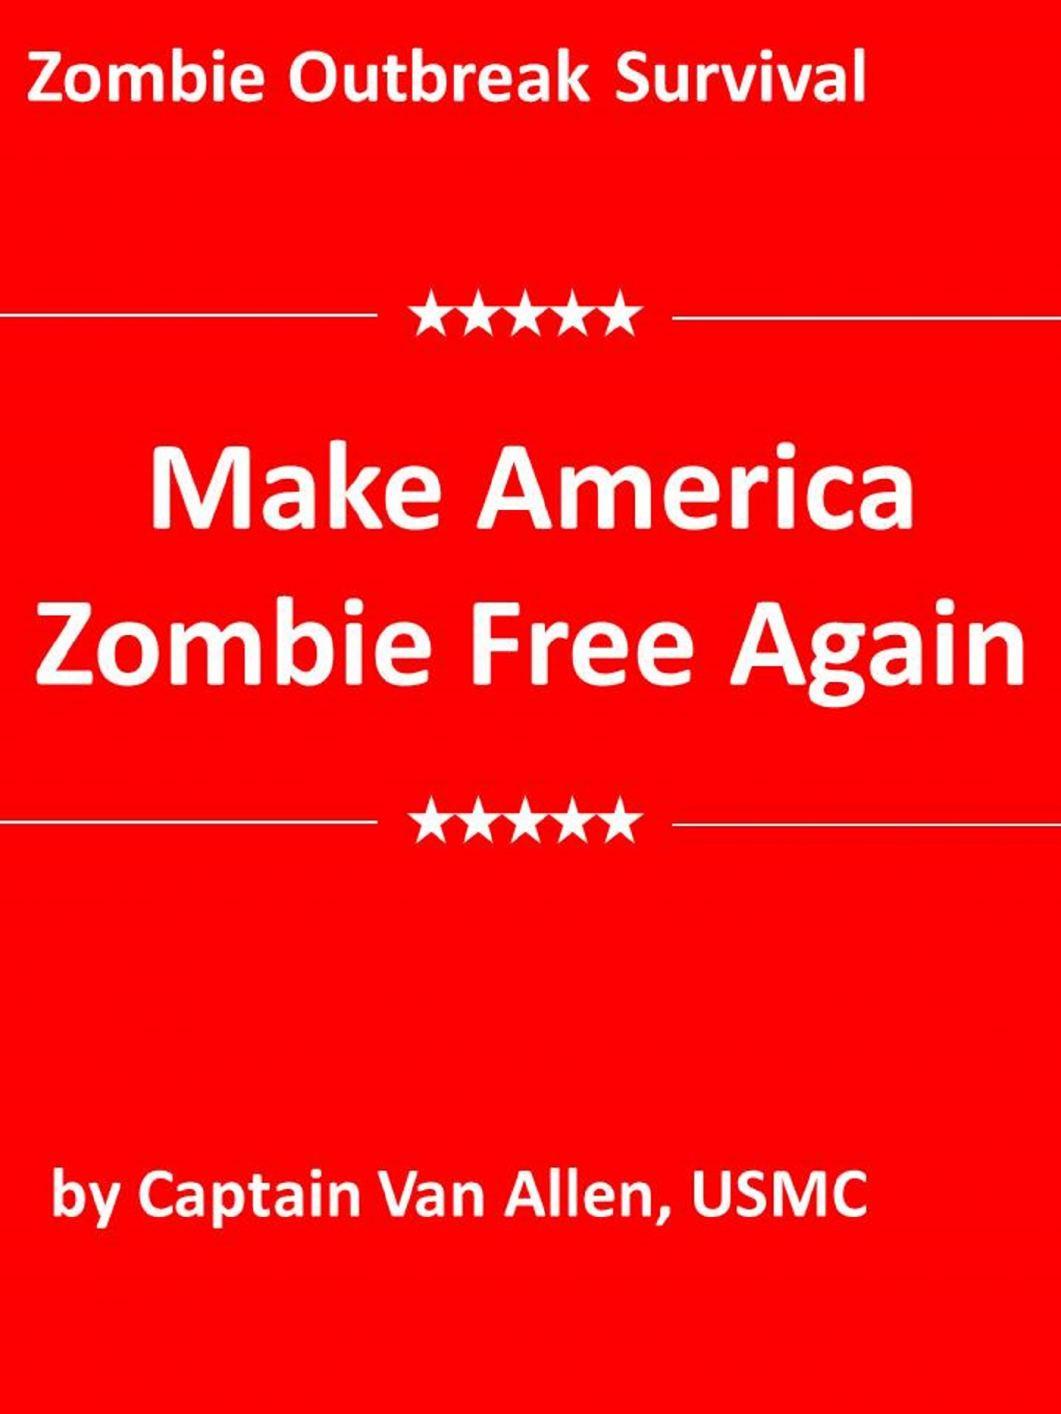 Captain Van Allen Promises to Make America Zombie Free Again